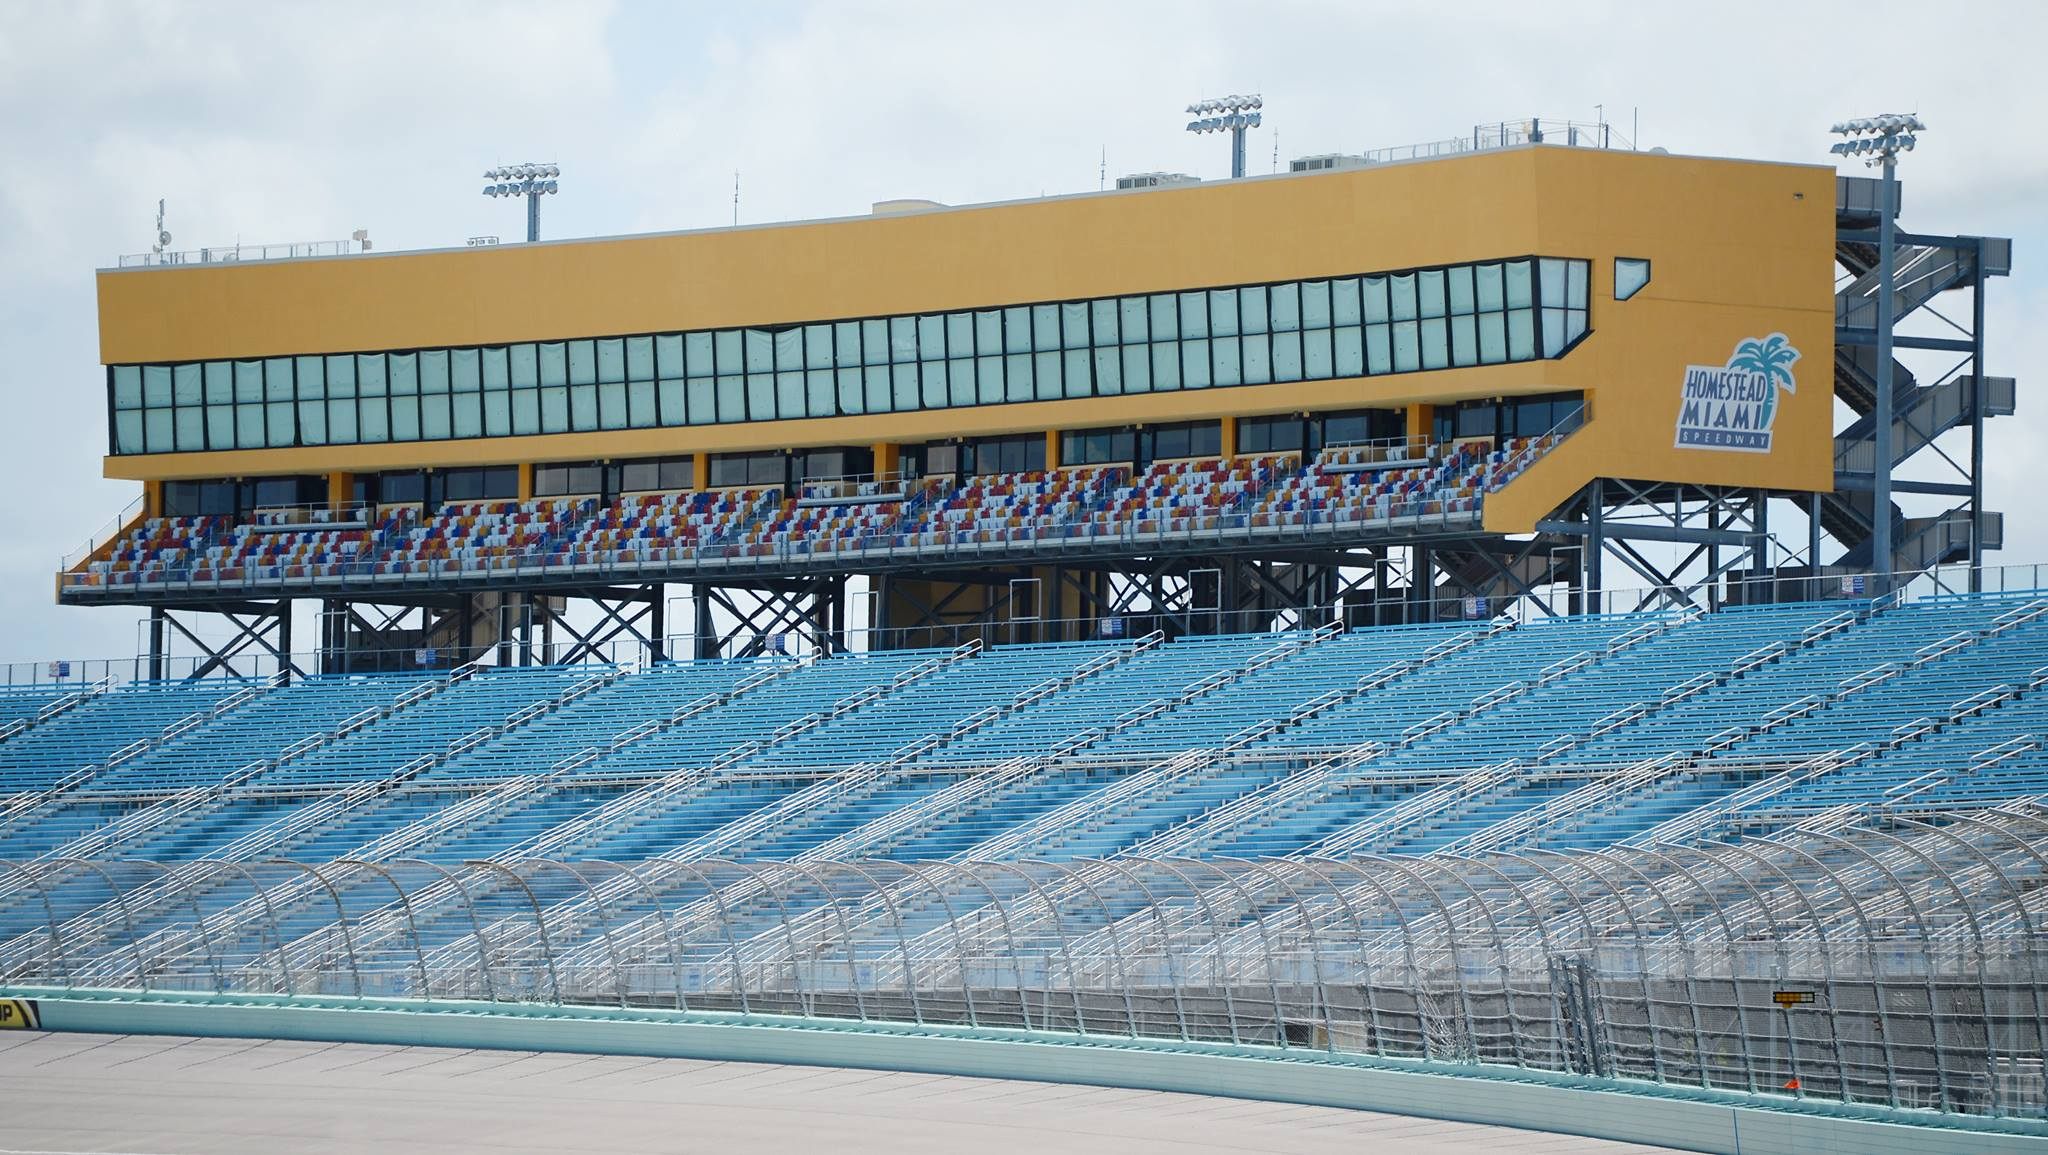 Homestead-Miami Speedway Hurricane Irma